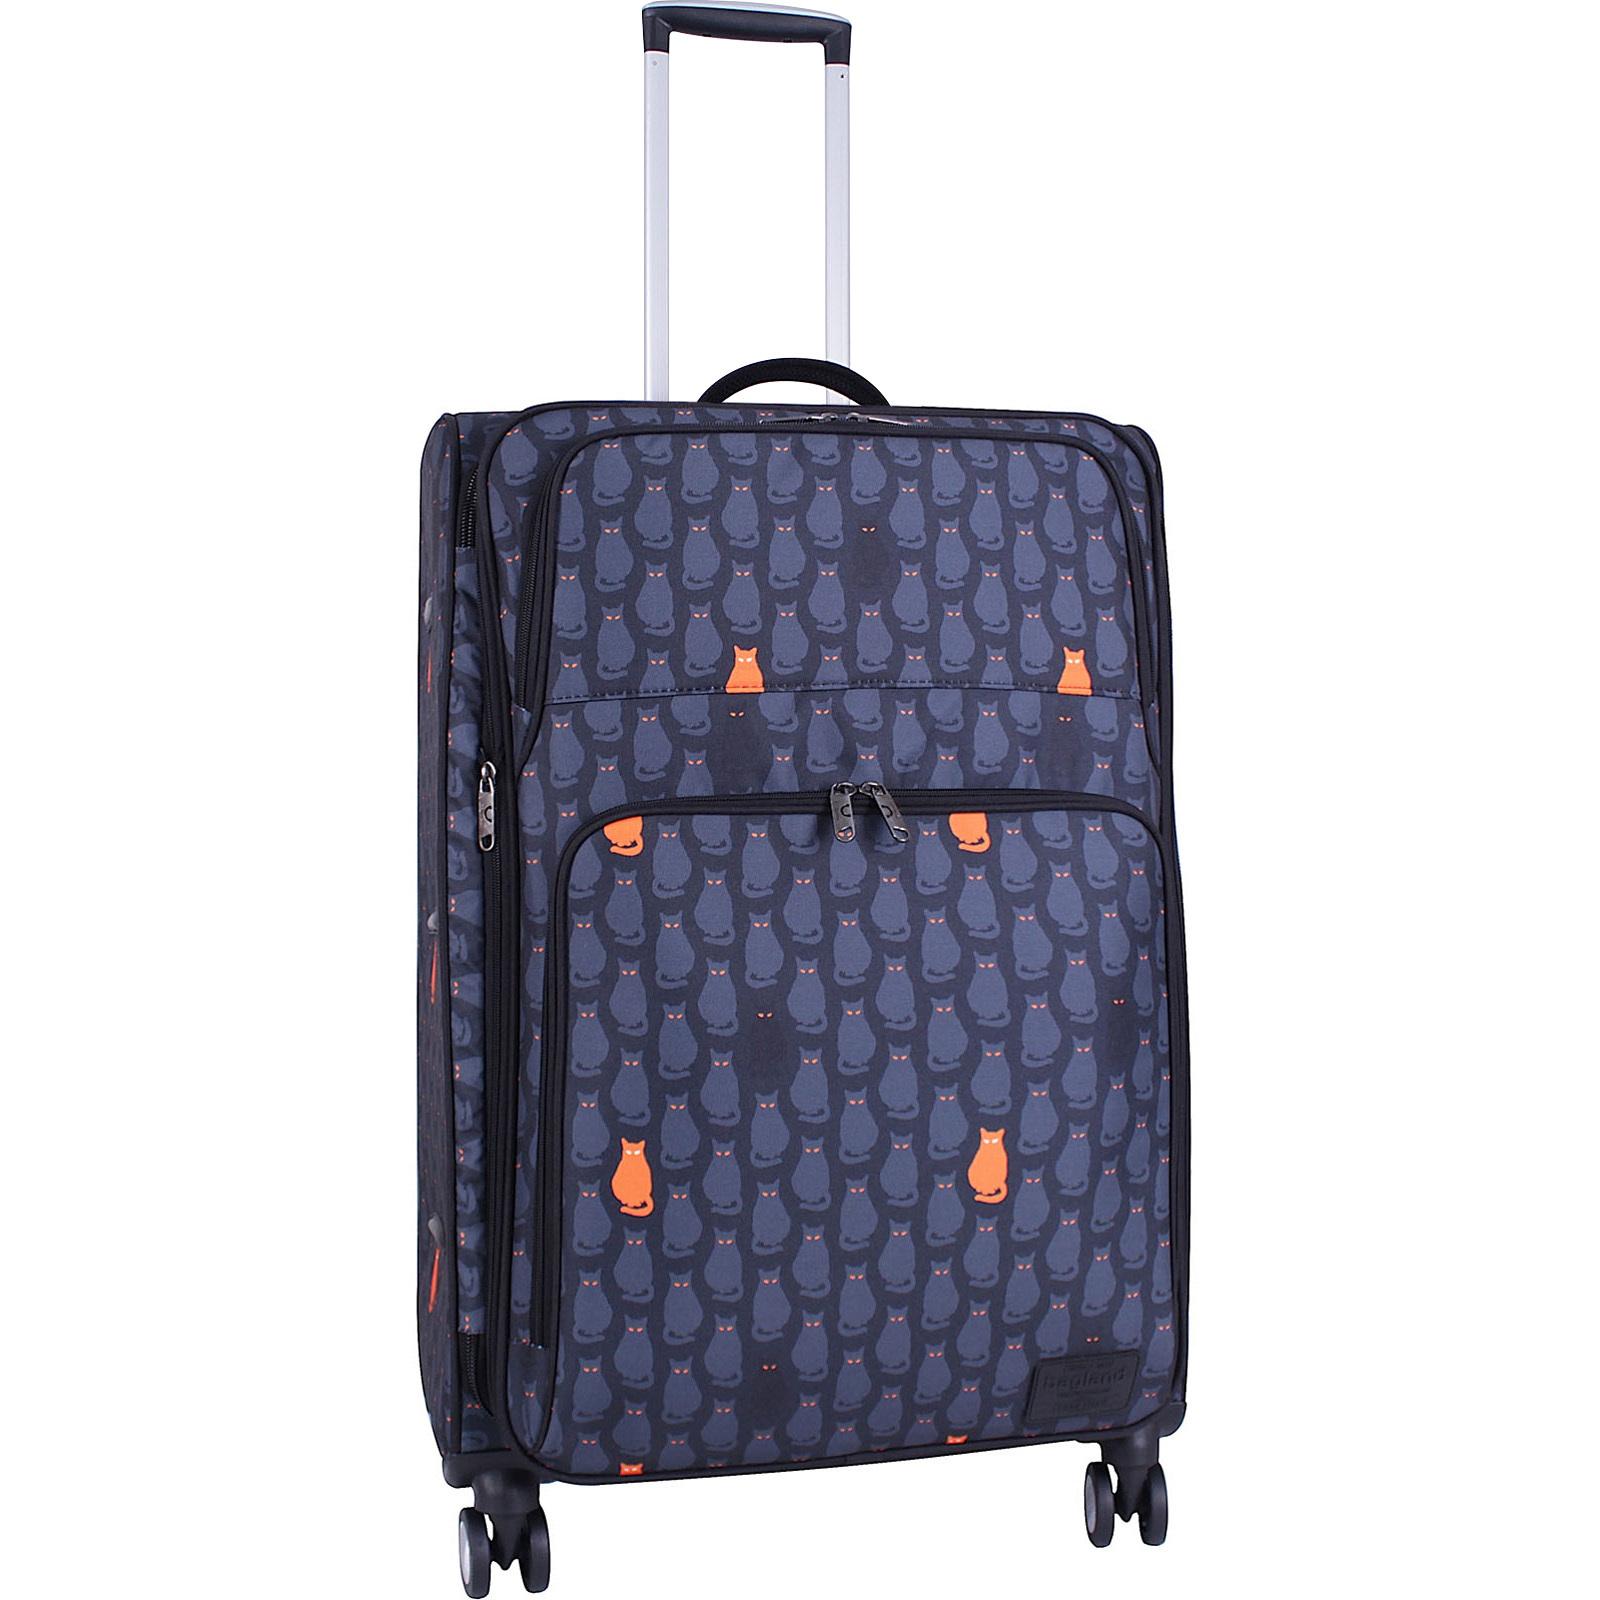 Дорожные чемоданы Чемодан Bagland Валенсия большой дизайн 83 л. сублімація 193 (0037966274) IMG_4895_суб.193_.JPG